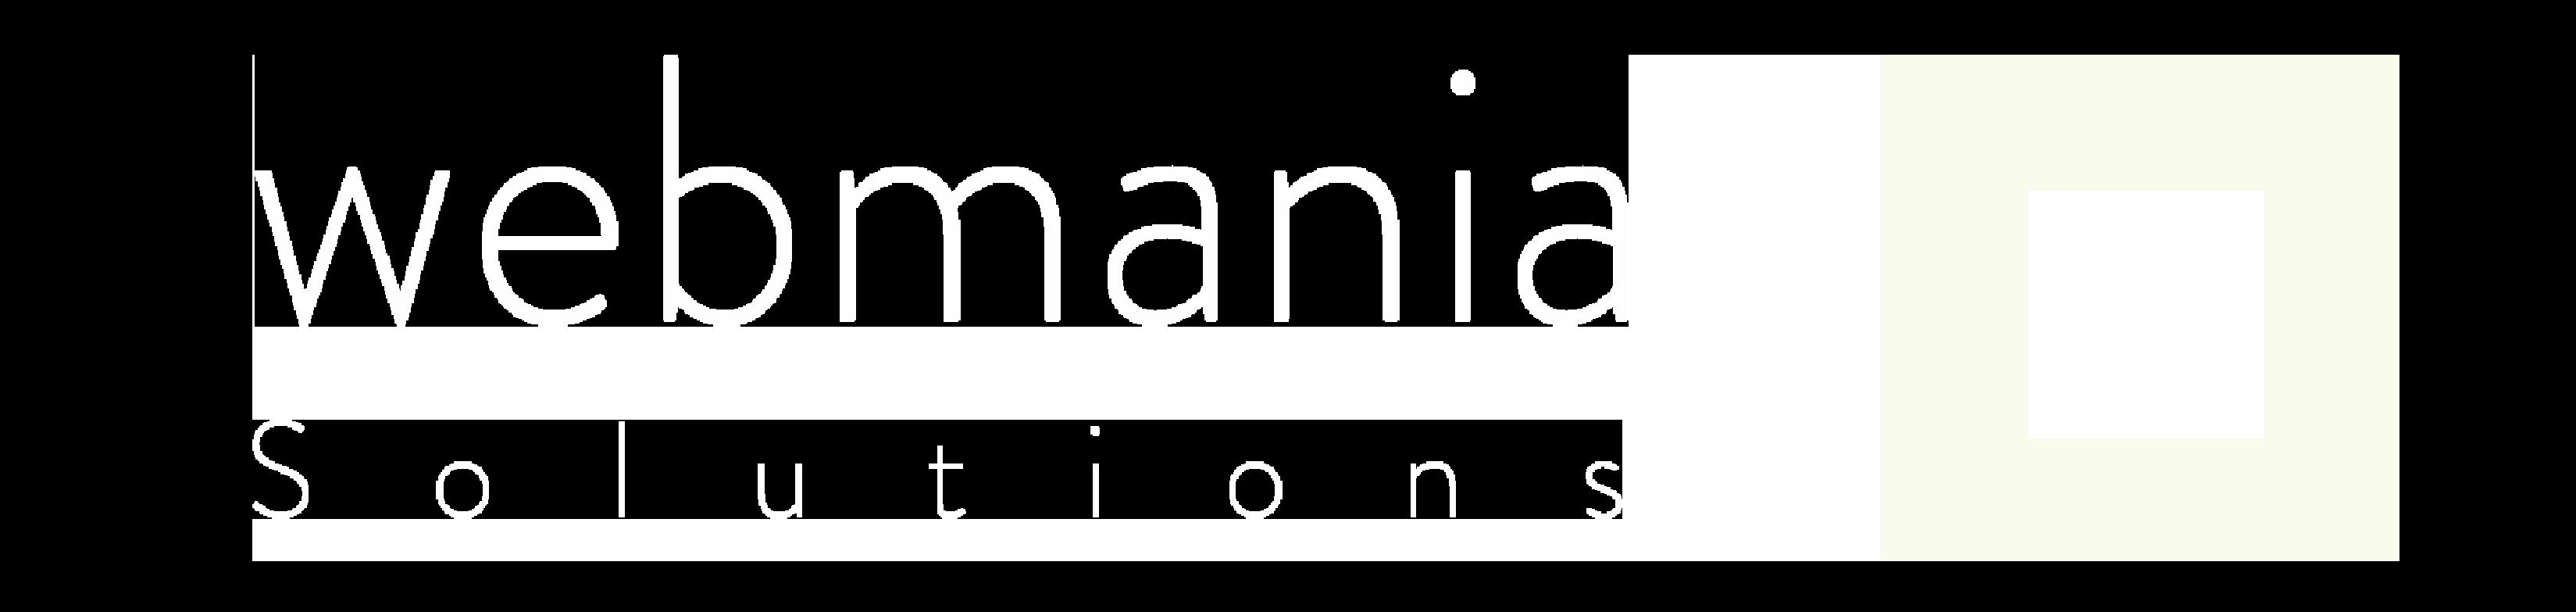 Webmania Agence web á Casablanca Maroc